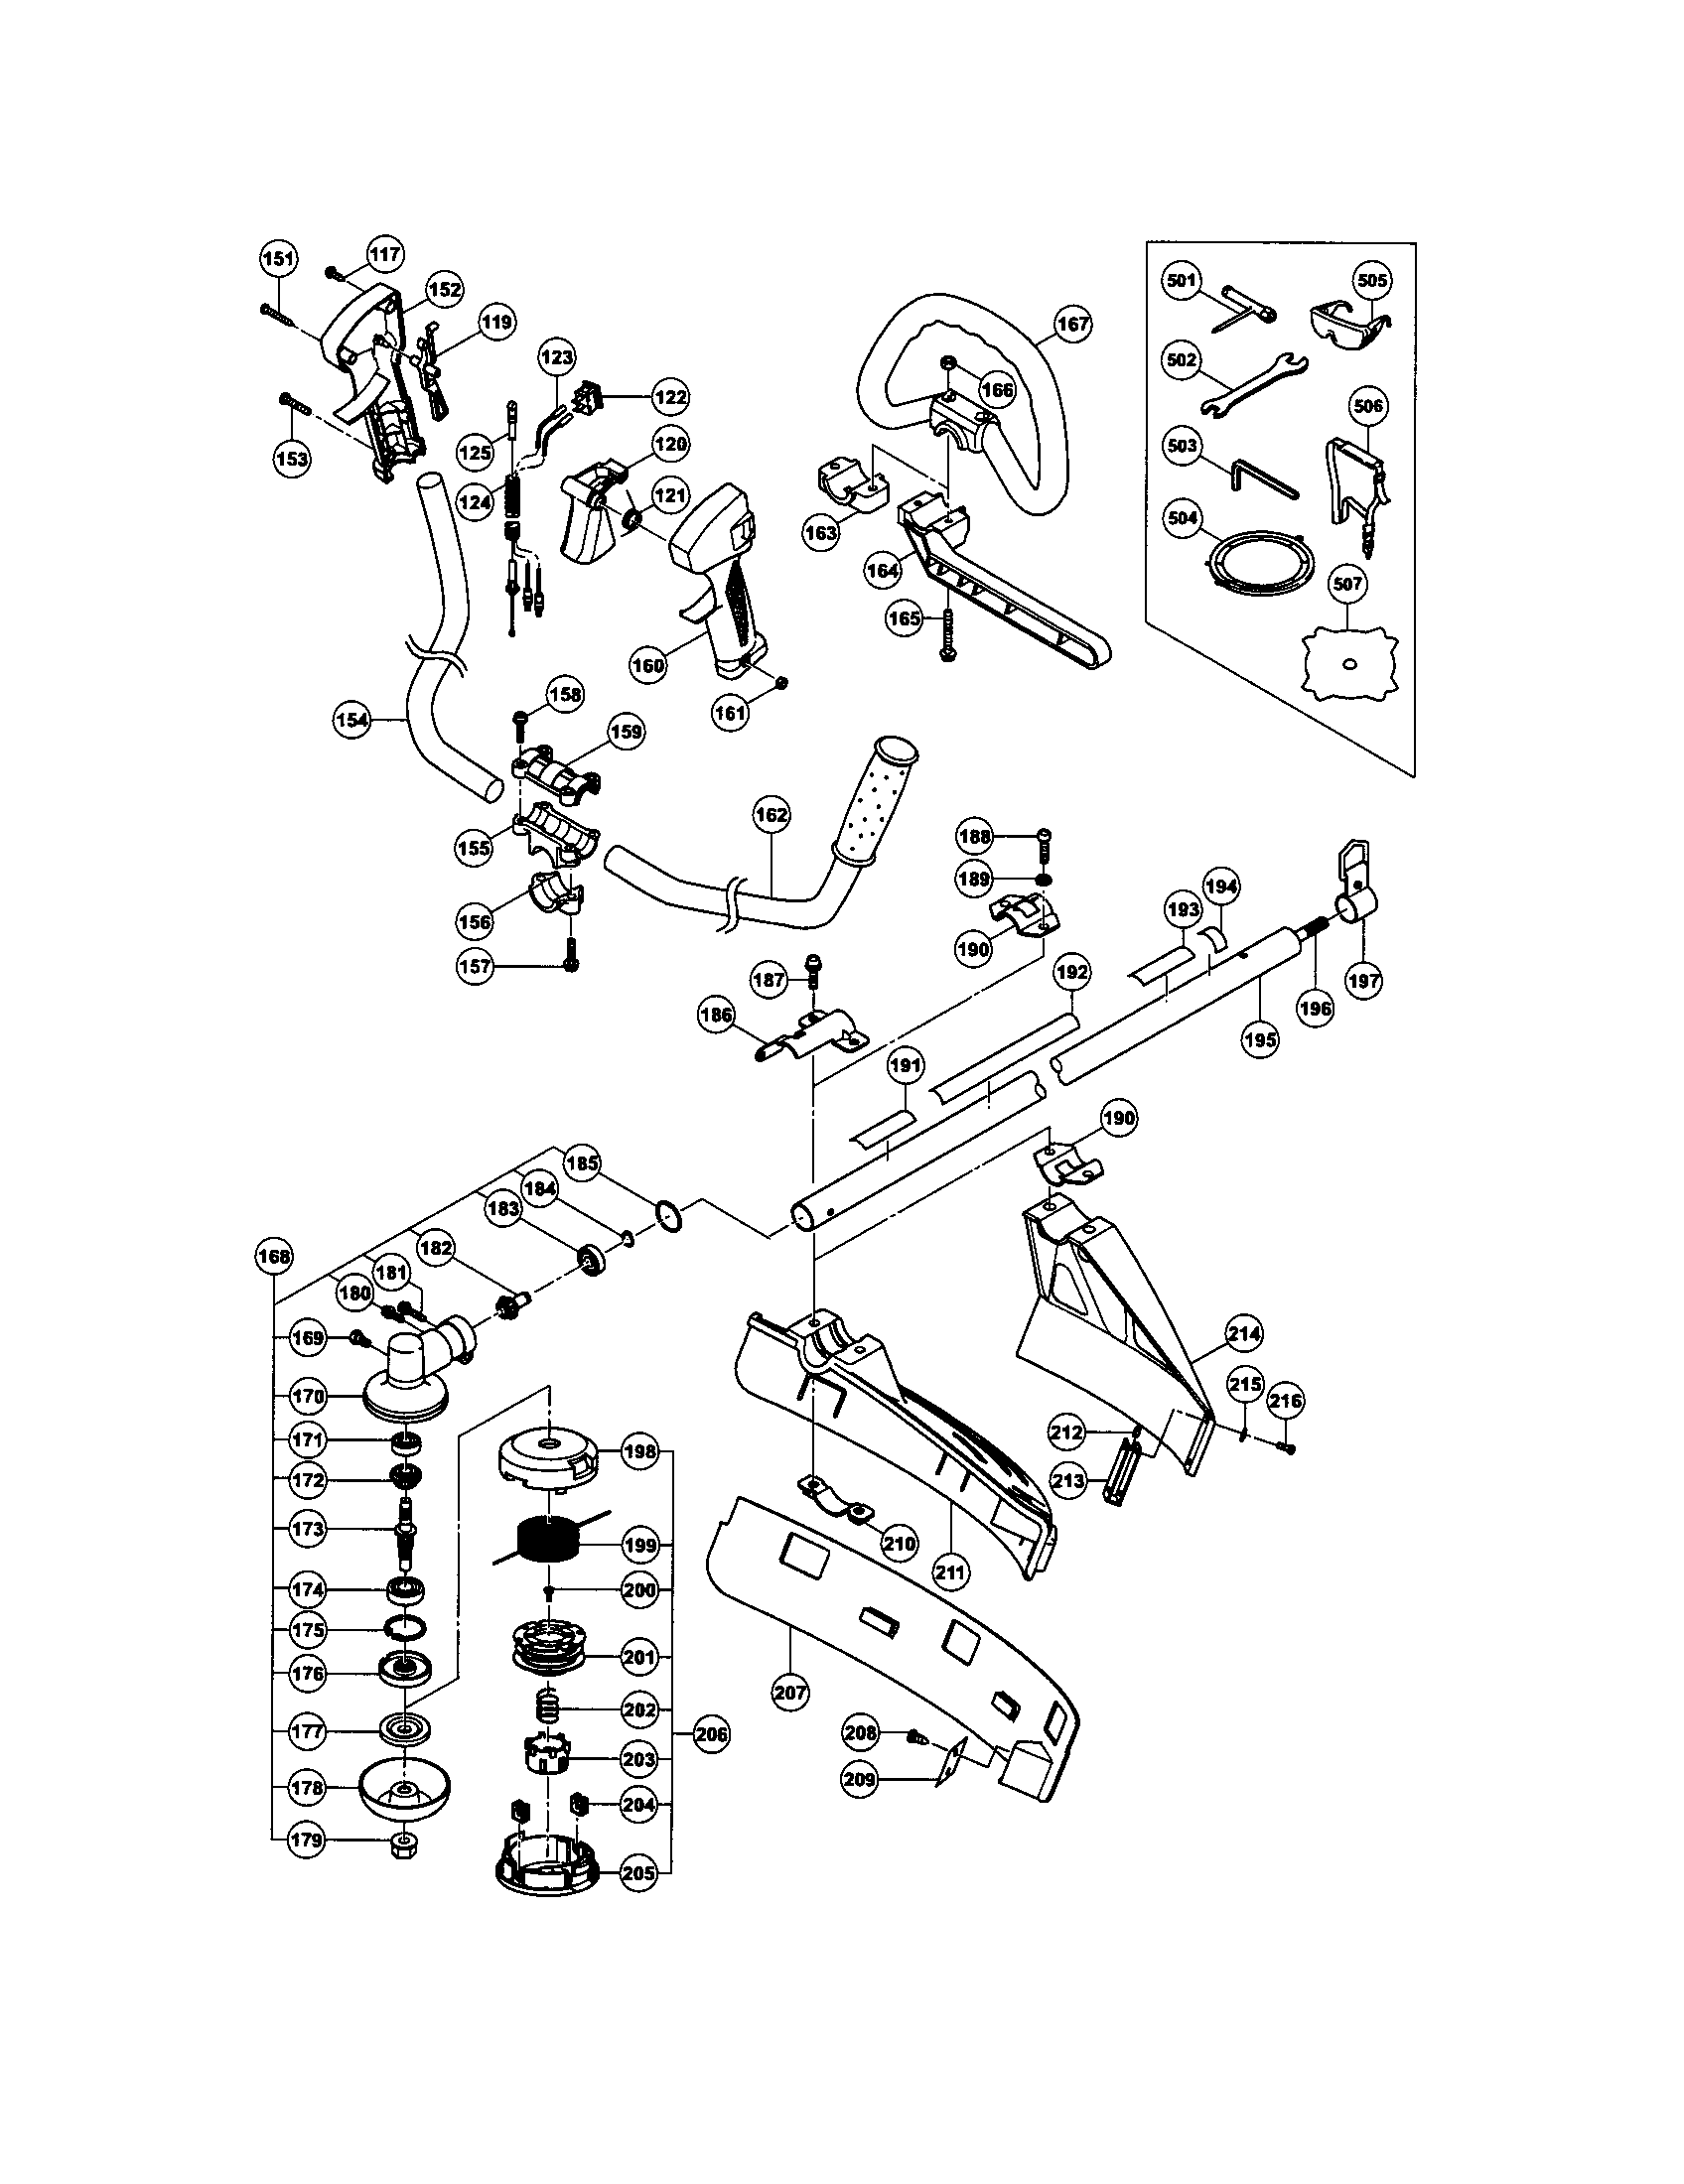 CG22EASSLP MANUAL PDF